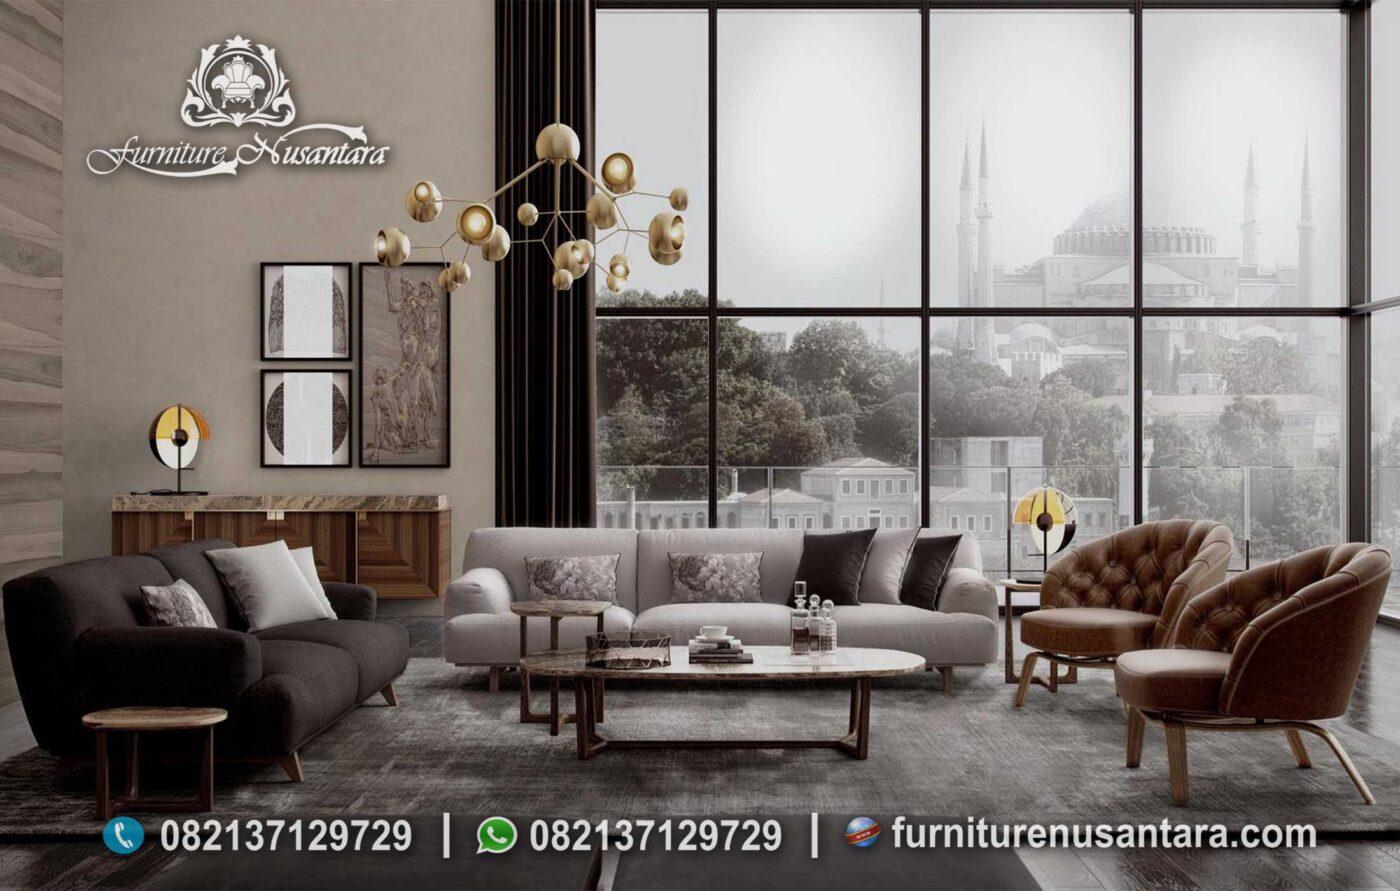 Info Harga Sofa Minimalis Terupdate ST-73, Furniture Nusantara